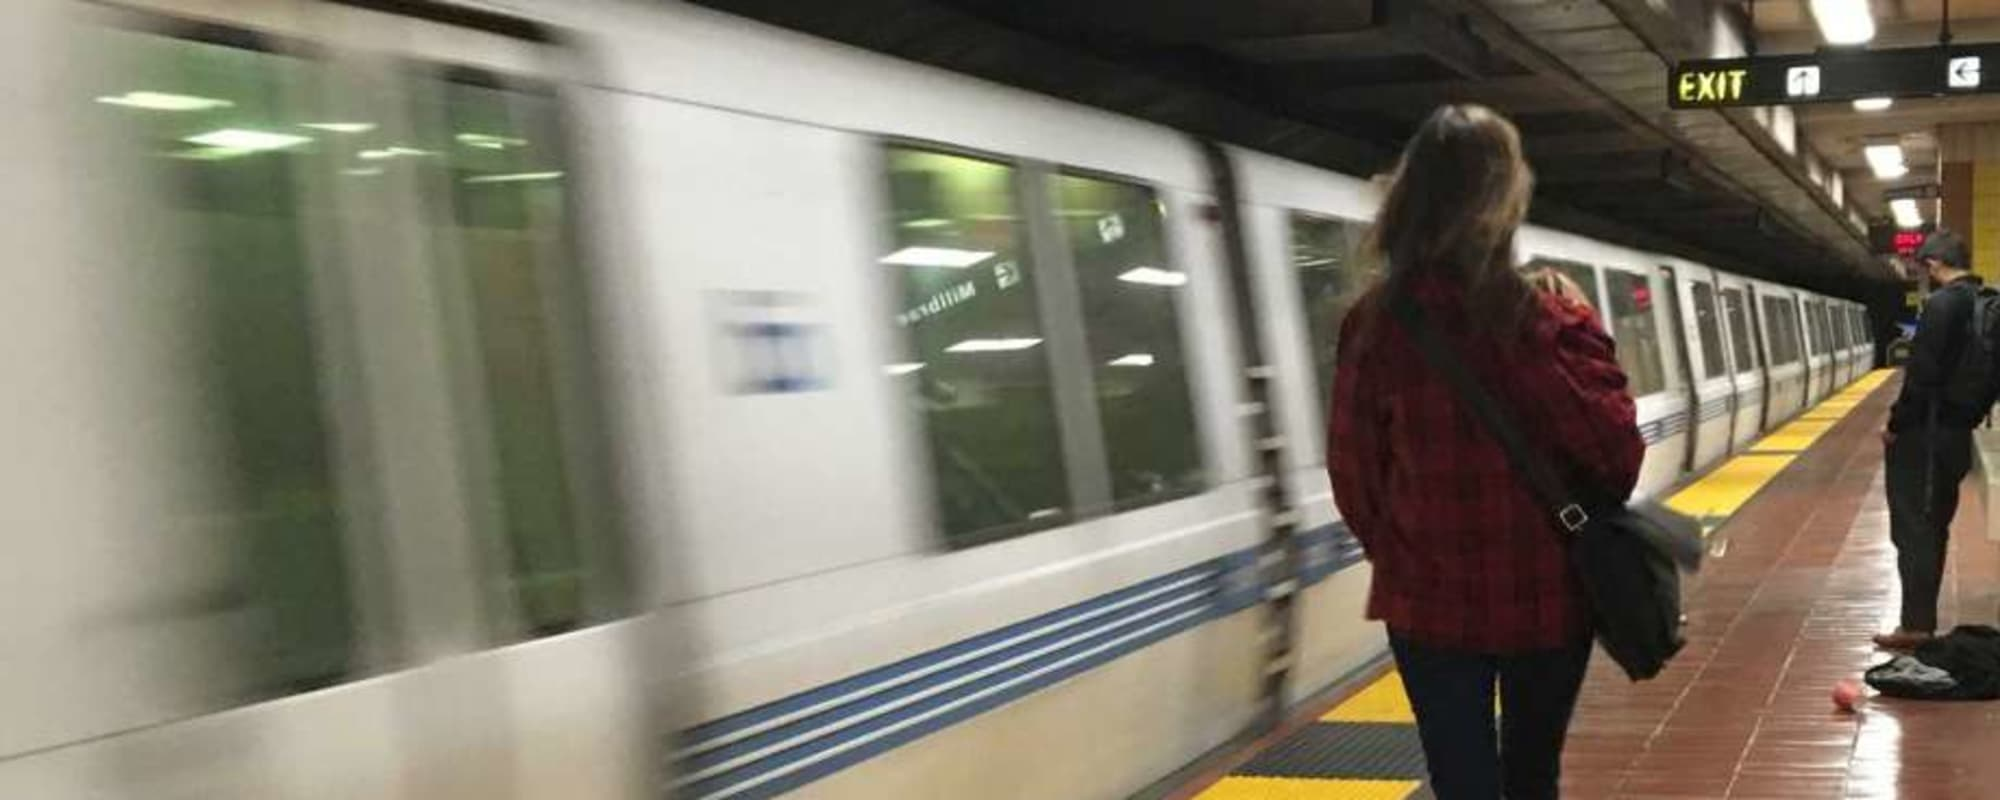 Speedy subway near The Moran in Oakland, California